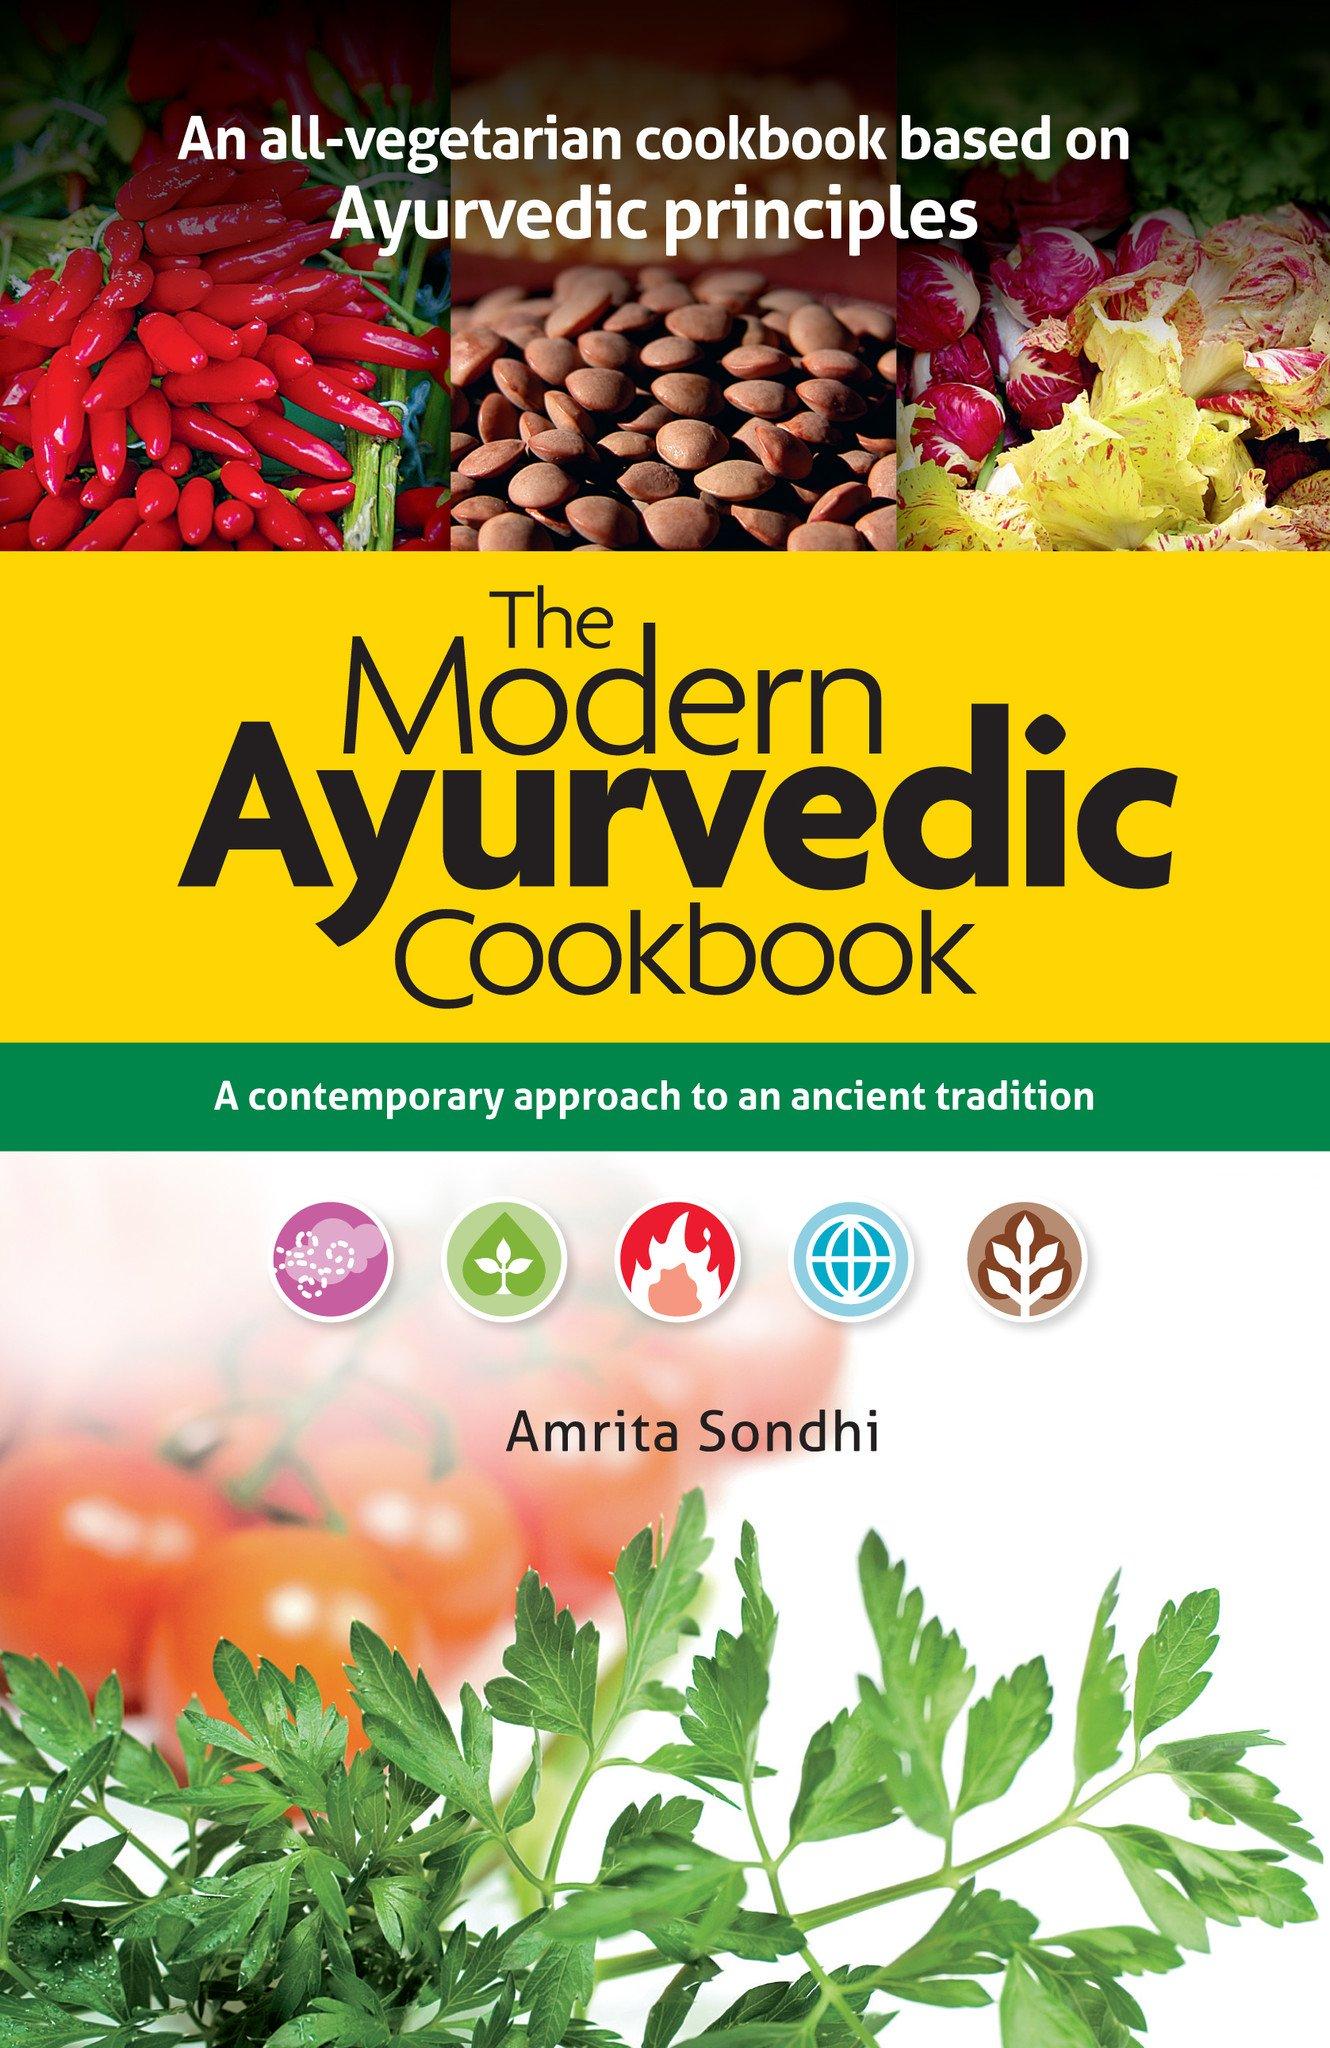 Modern Ayurvedic Cookbook